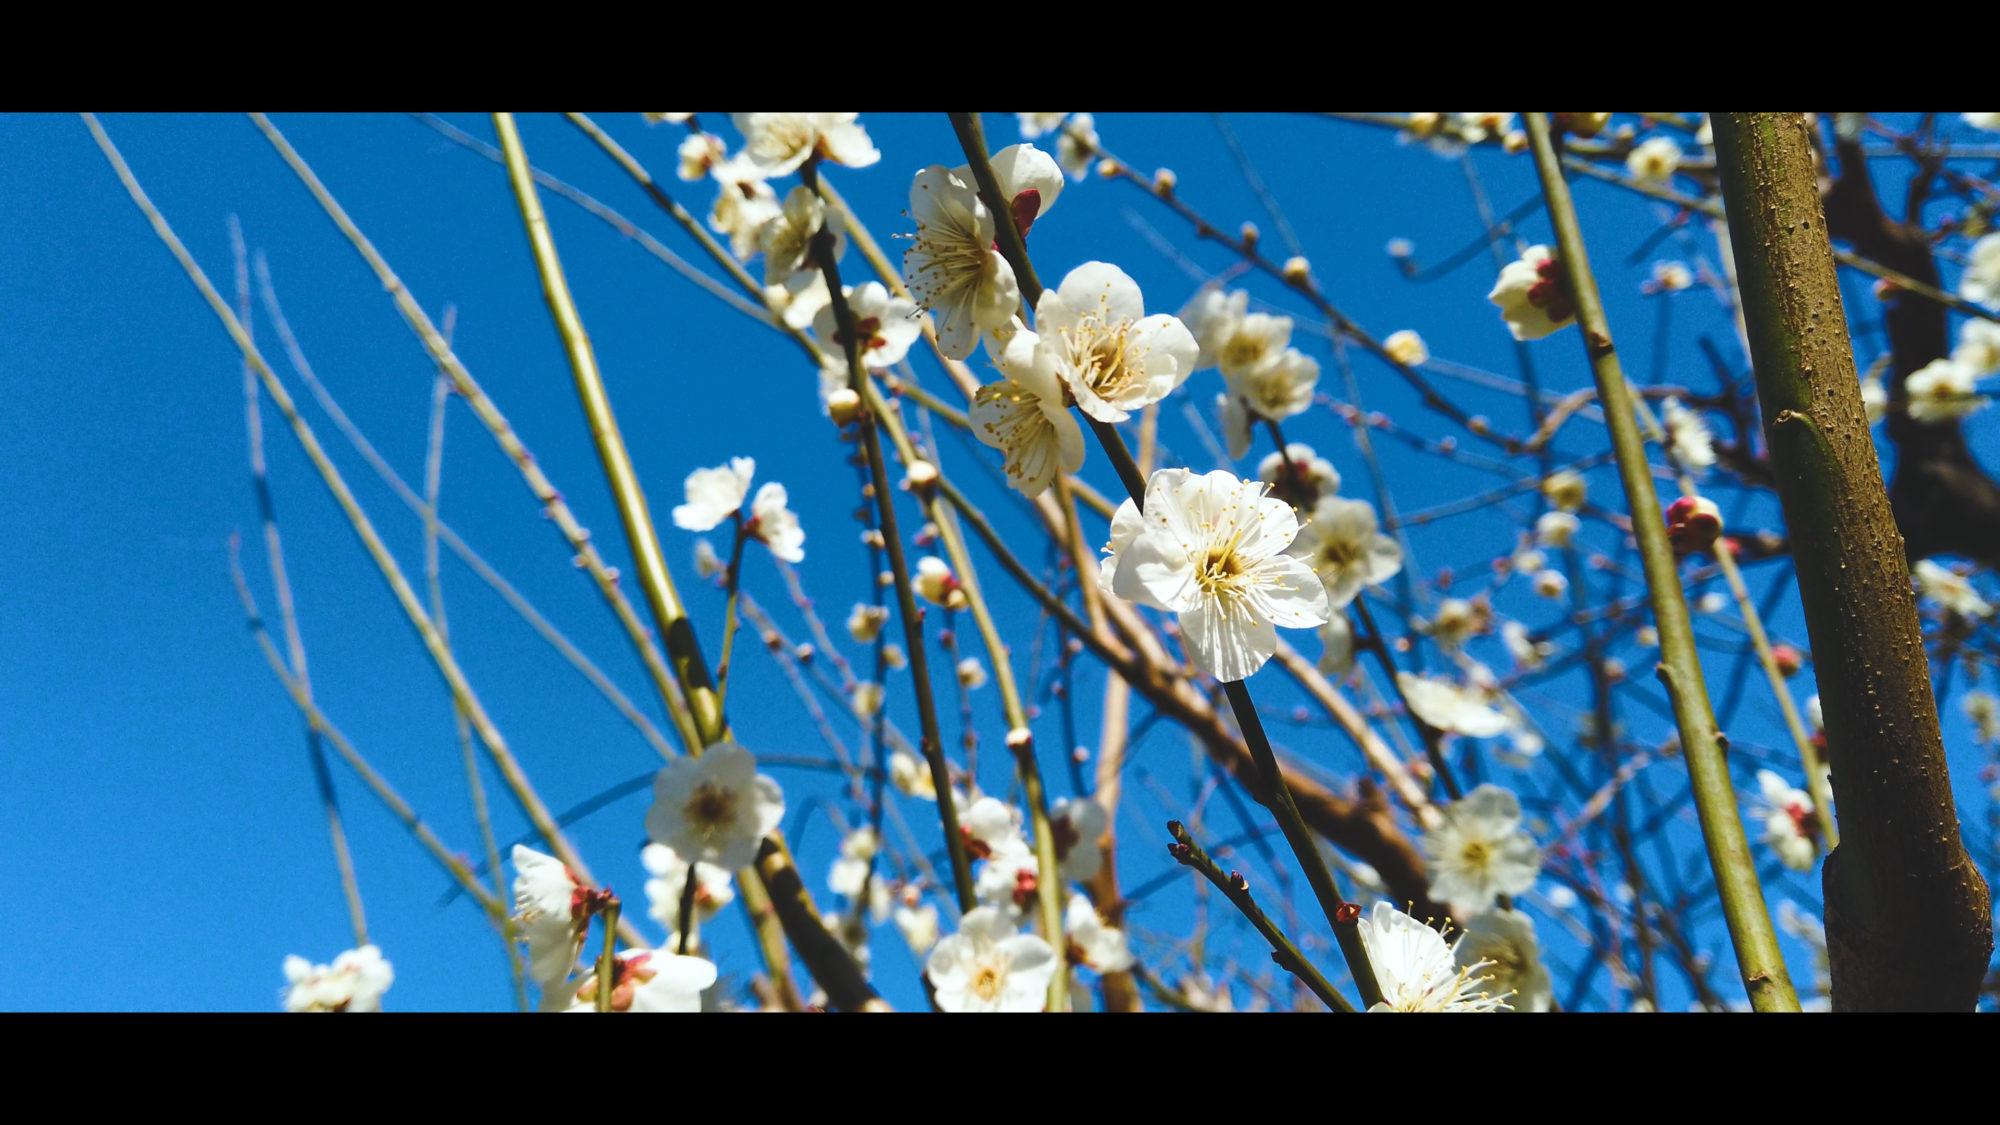 3943a68ee5bcb17d46e15717f00dfd6f-e1581433589645 大阪府 鶴見緑地公園(梅や河津桜に水仙など春の花おすすめの写真スポット。 アクセス情報や交通手段・駐車場情報などまとめ)